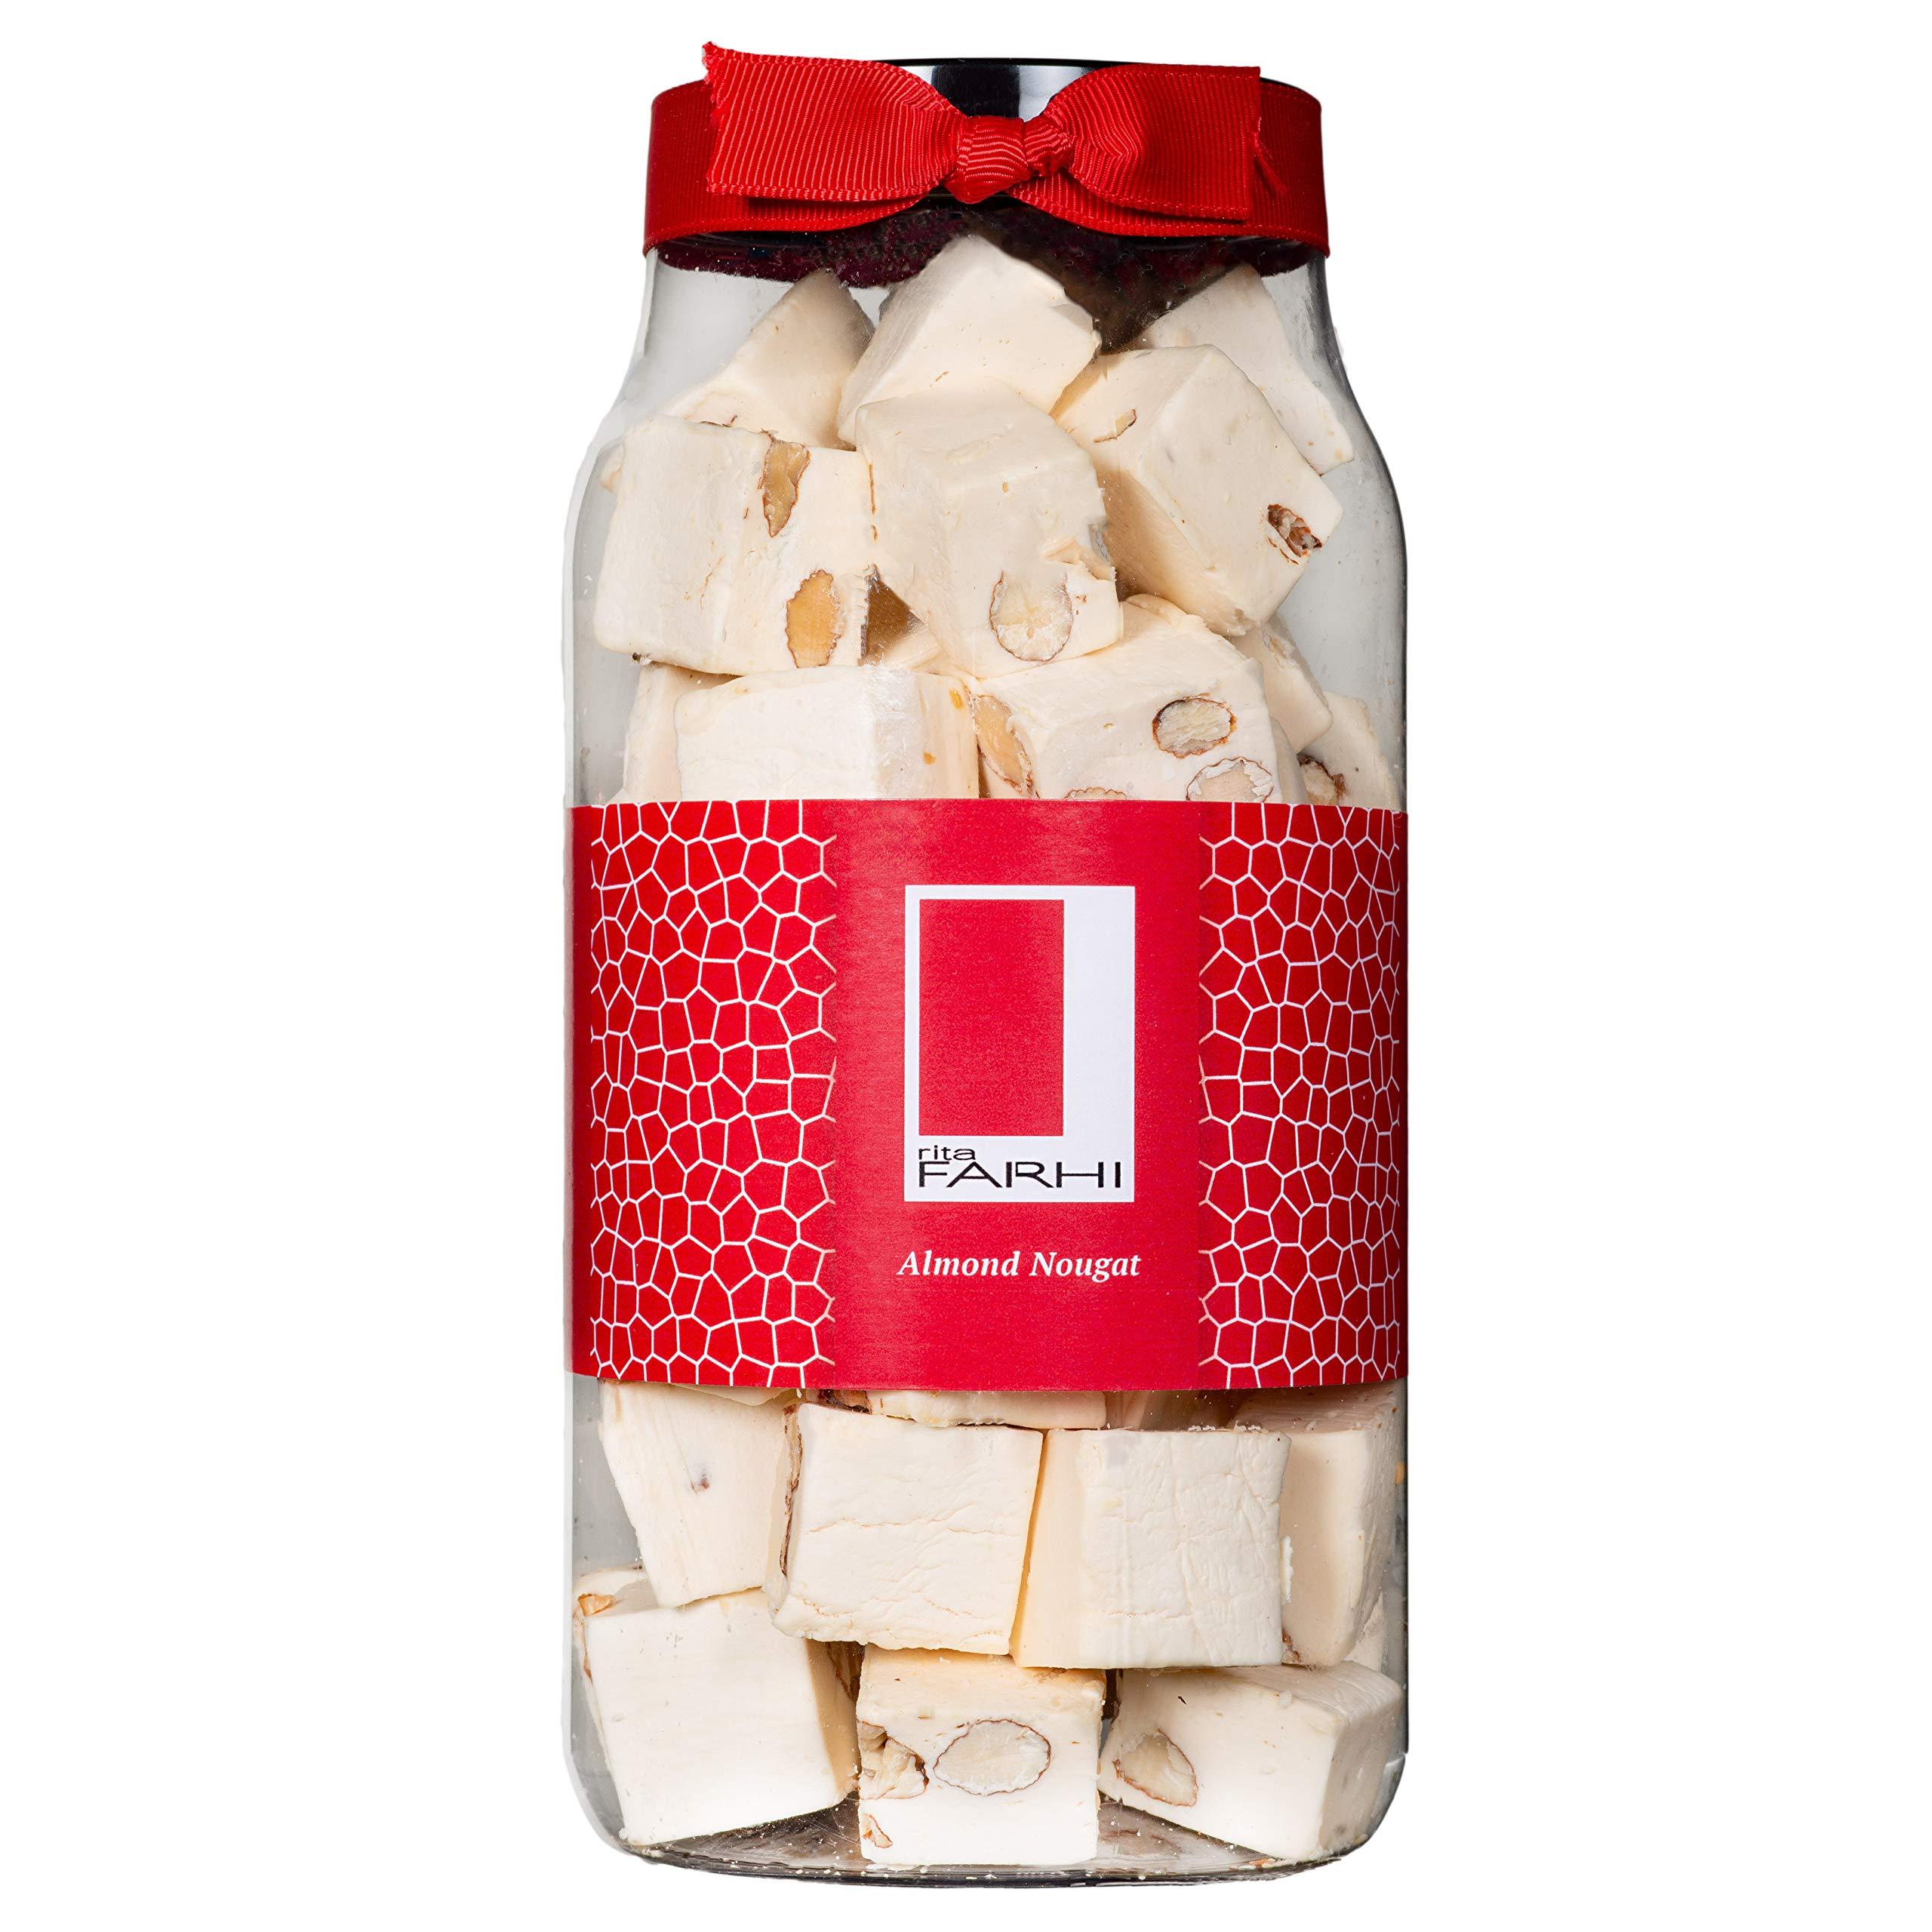 Rita Farhi Traditional Almond Nougat in a Gift Jar, 500 g